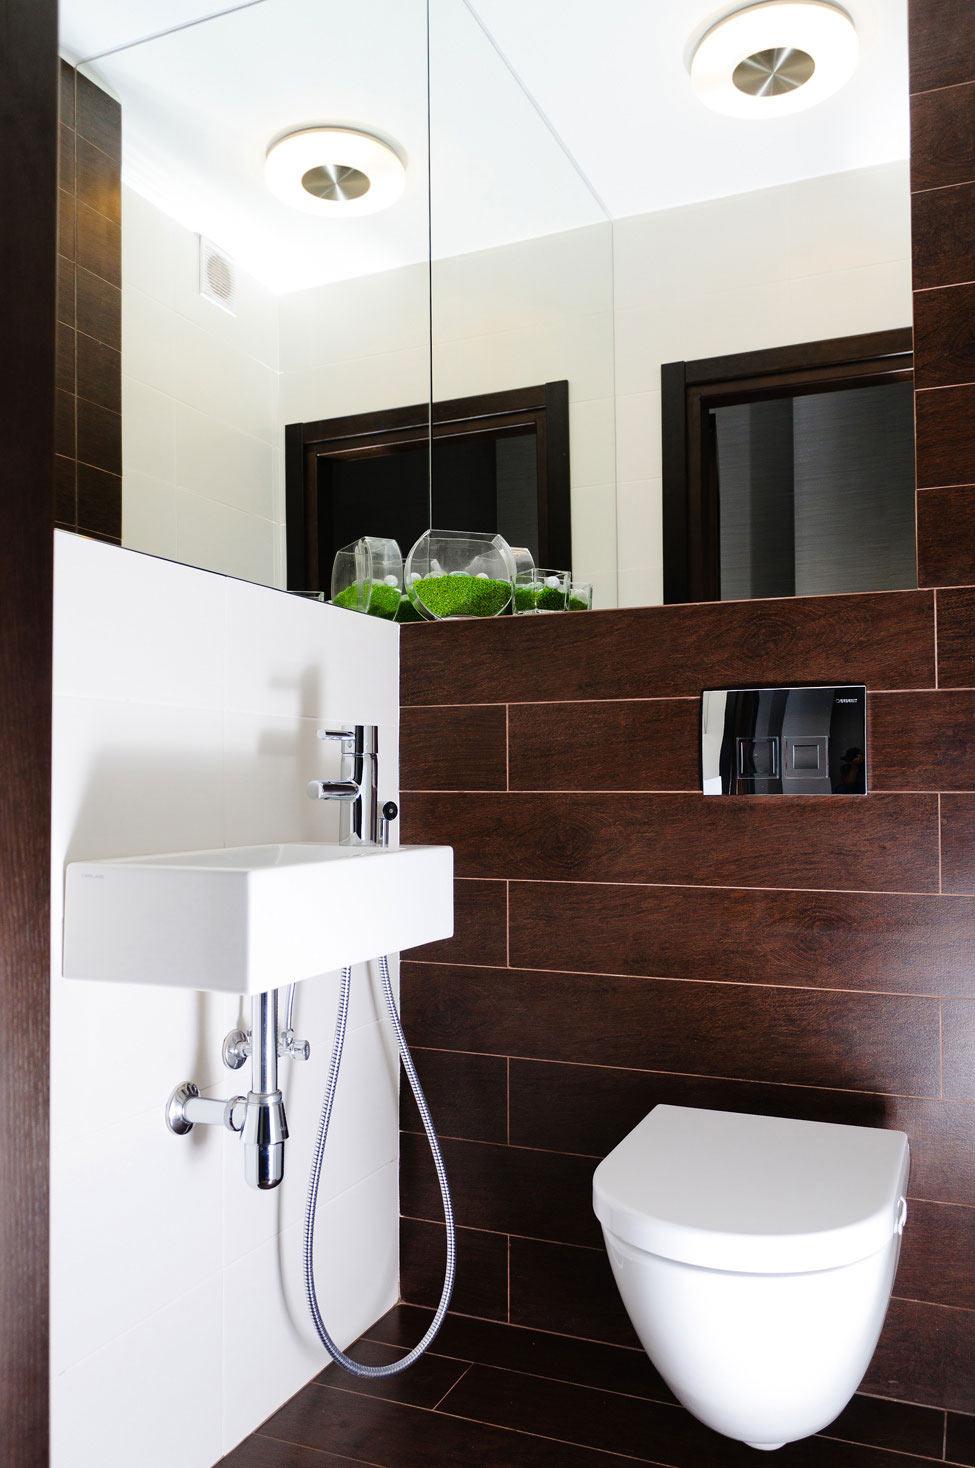 Contemporary Bathroom, Apartment Renovation in Odessa, Ukraine